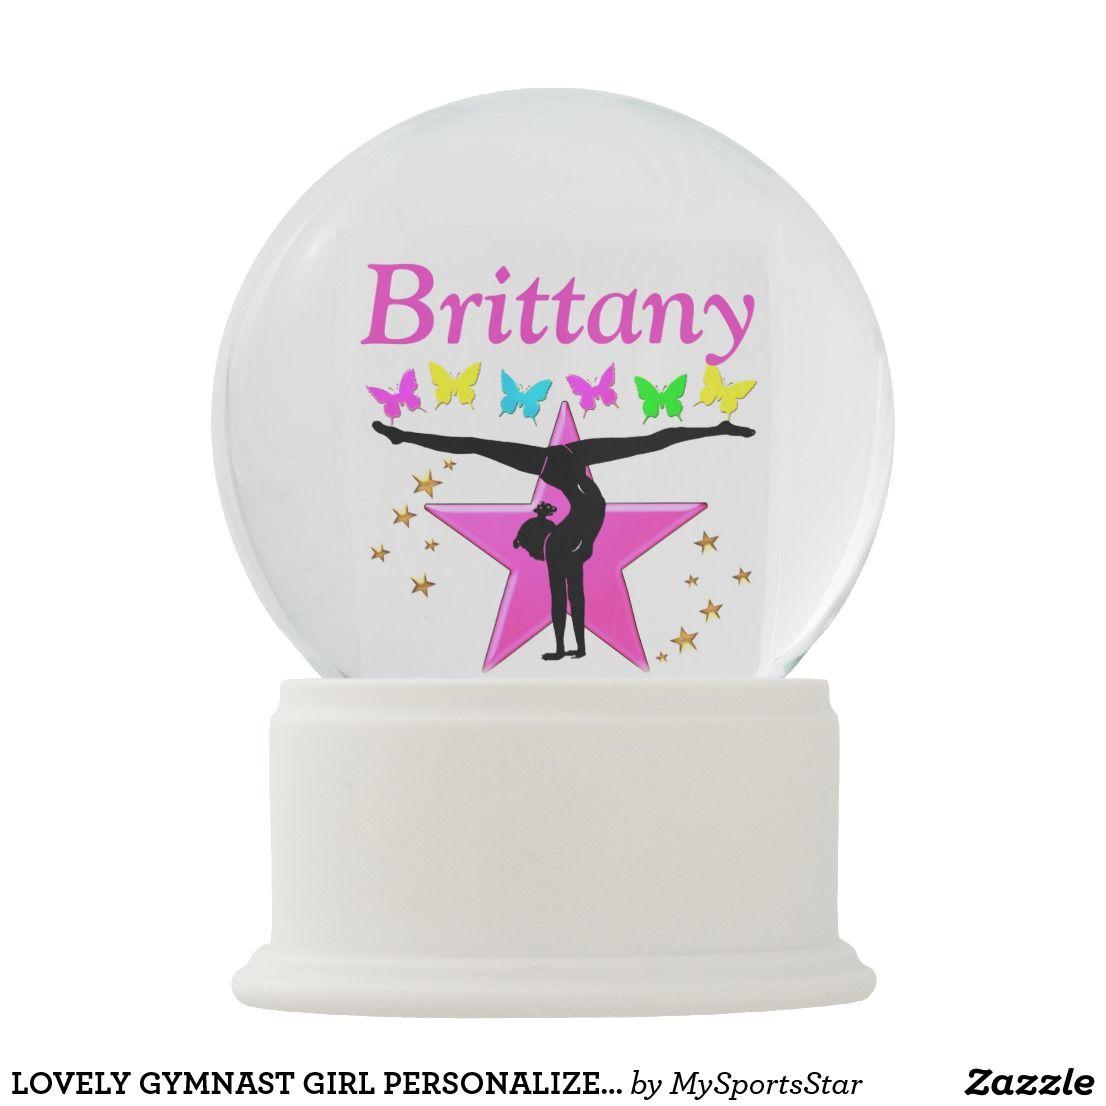 Lovely Gymnast Girl Personalized Snow Globe Zazzle Com Personalised Snow Globes Snow Globes Girl Personalized